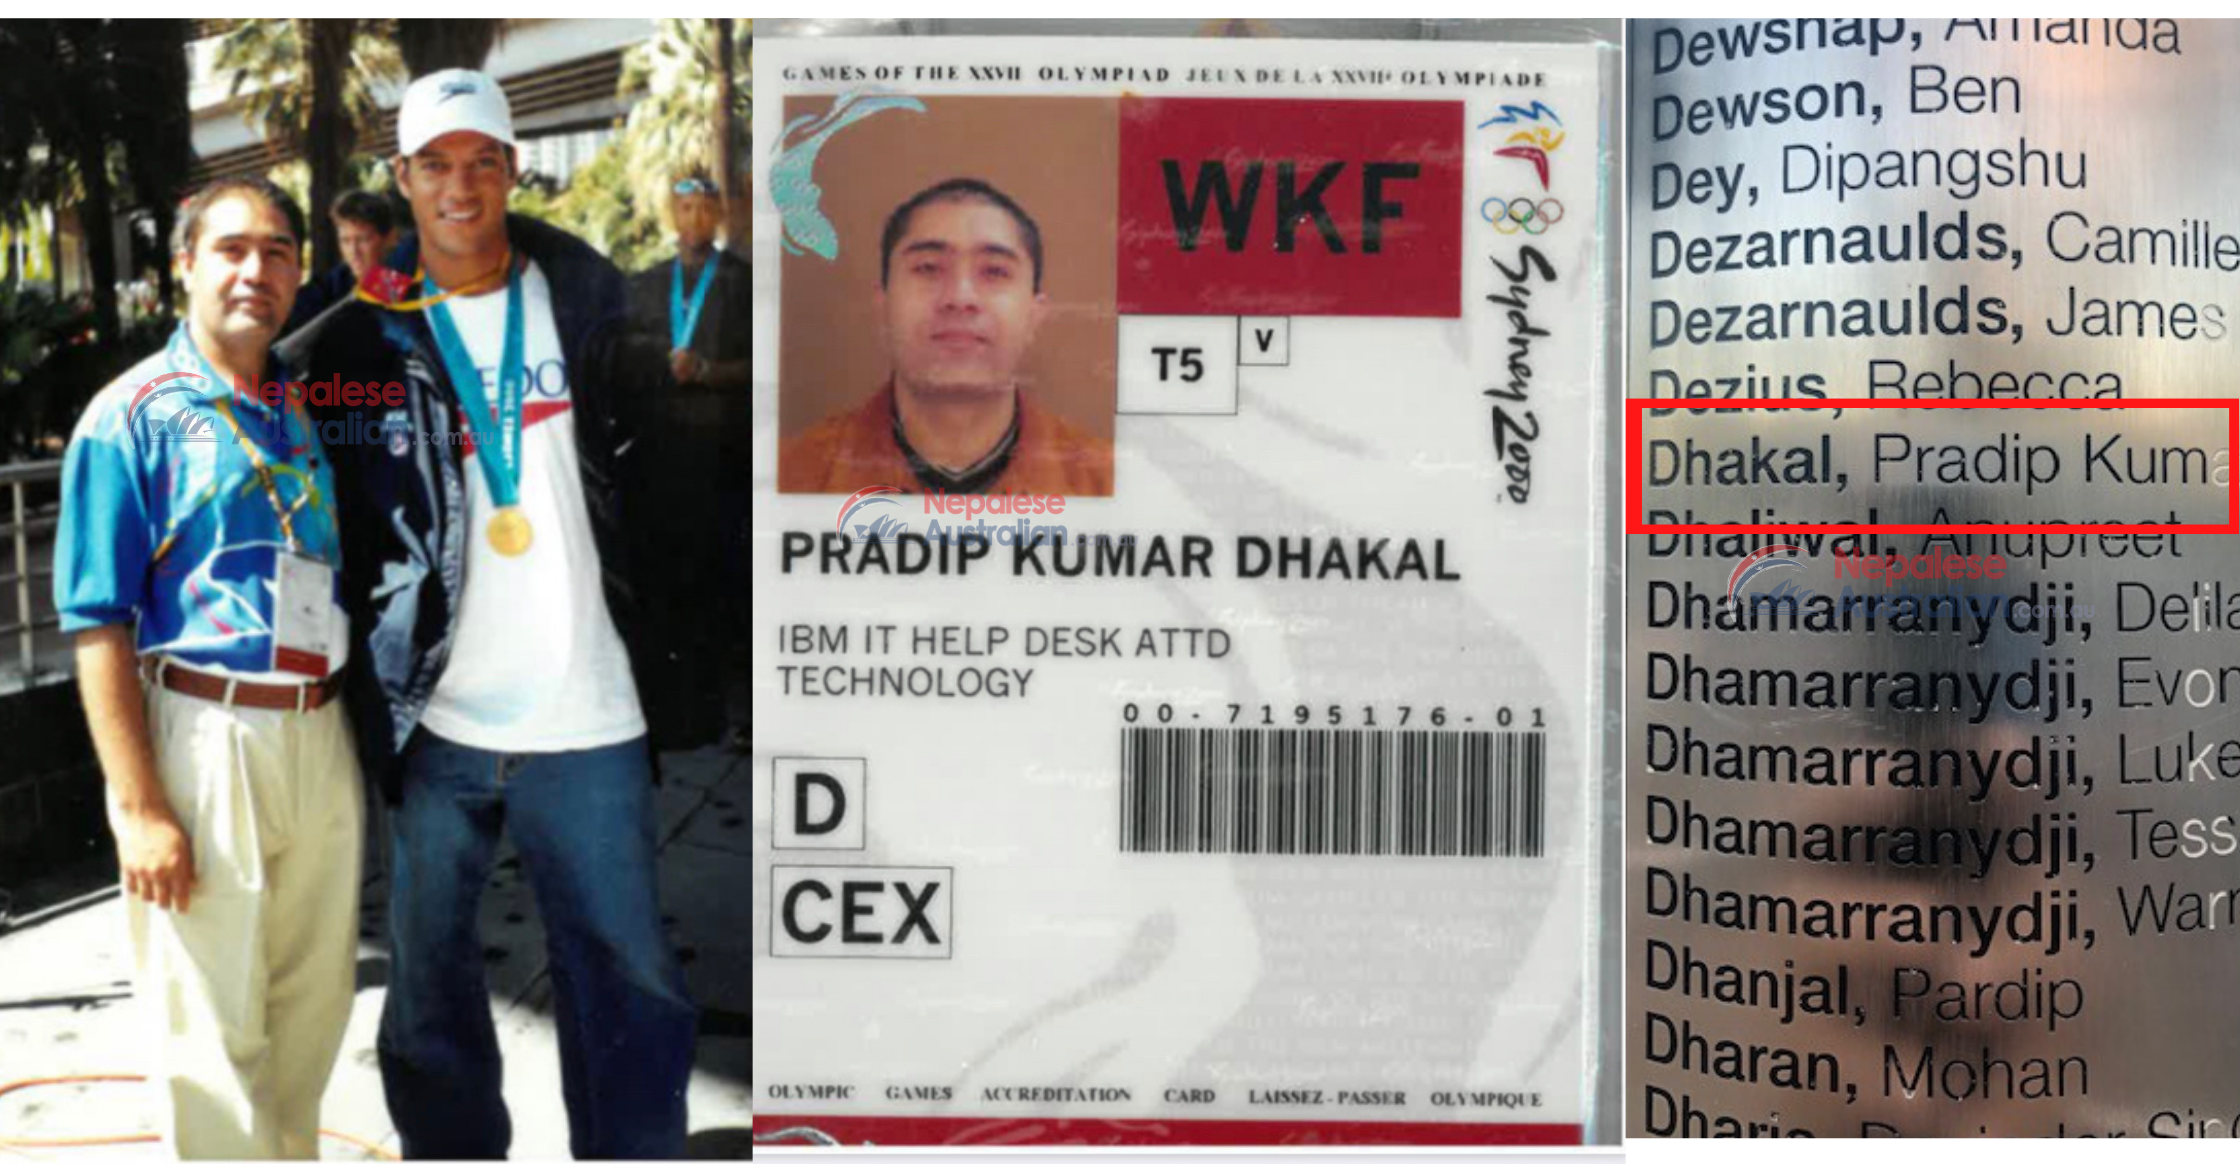 Sydney Olympic Games 2000- Nepalese Volunteer Pradip Kumar Dhakal